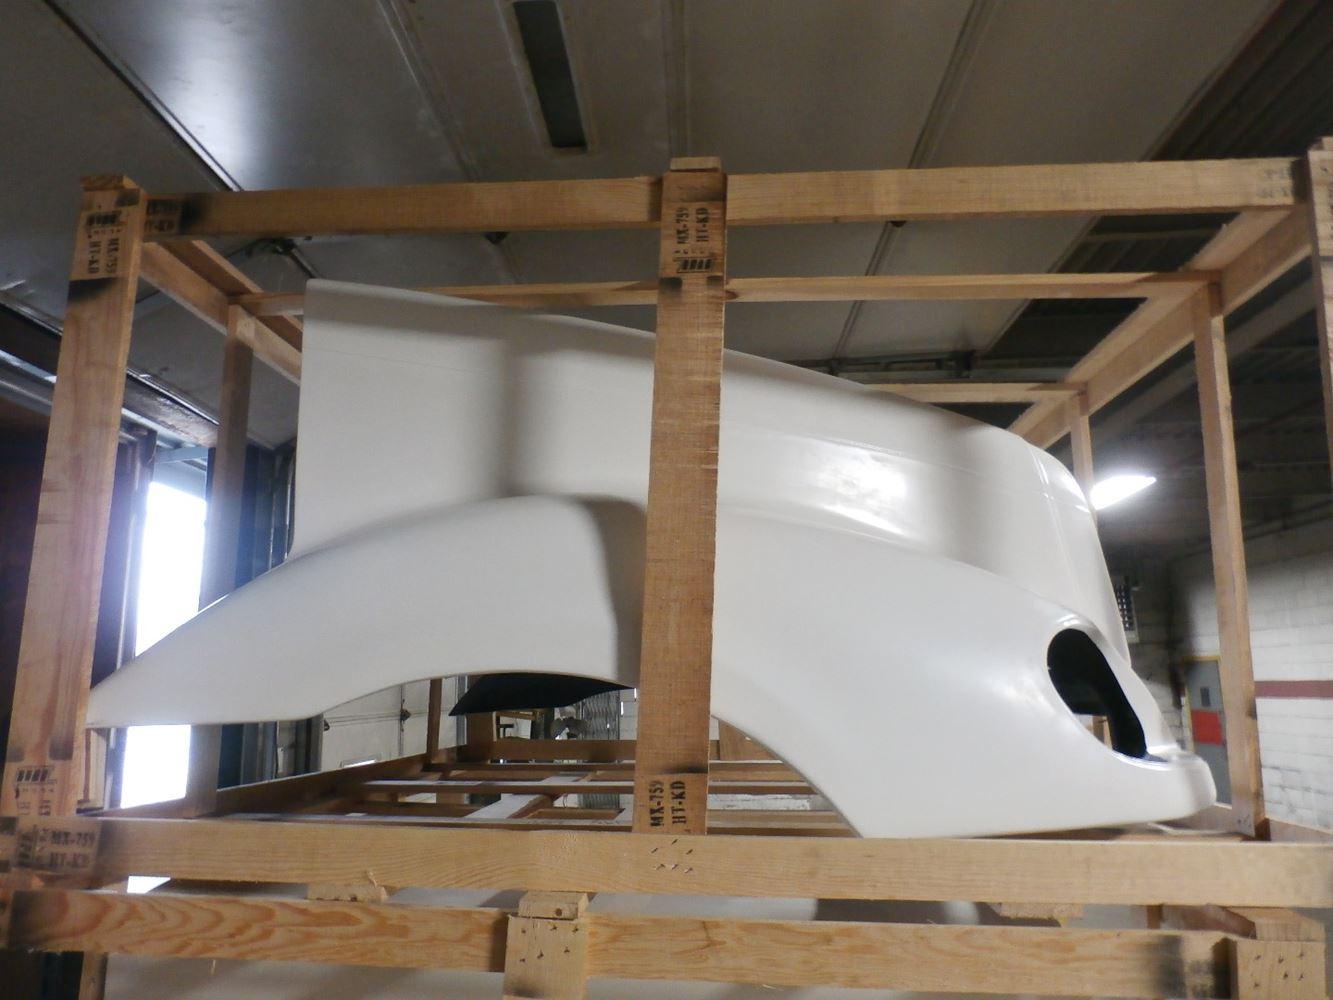 Media 2 for Freightliner COLUMBIA Hoods